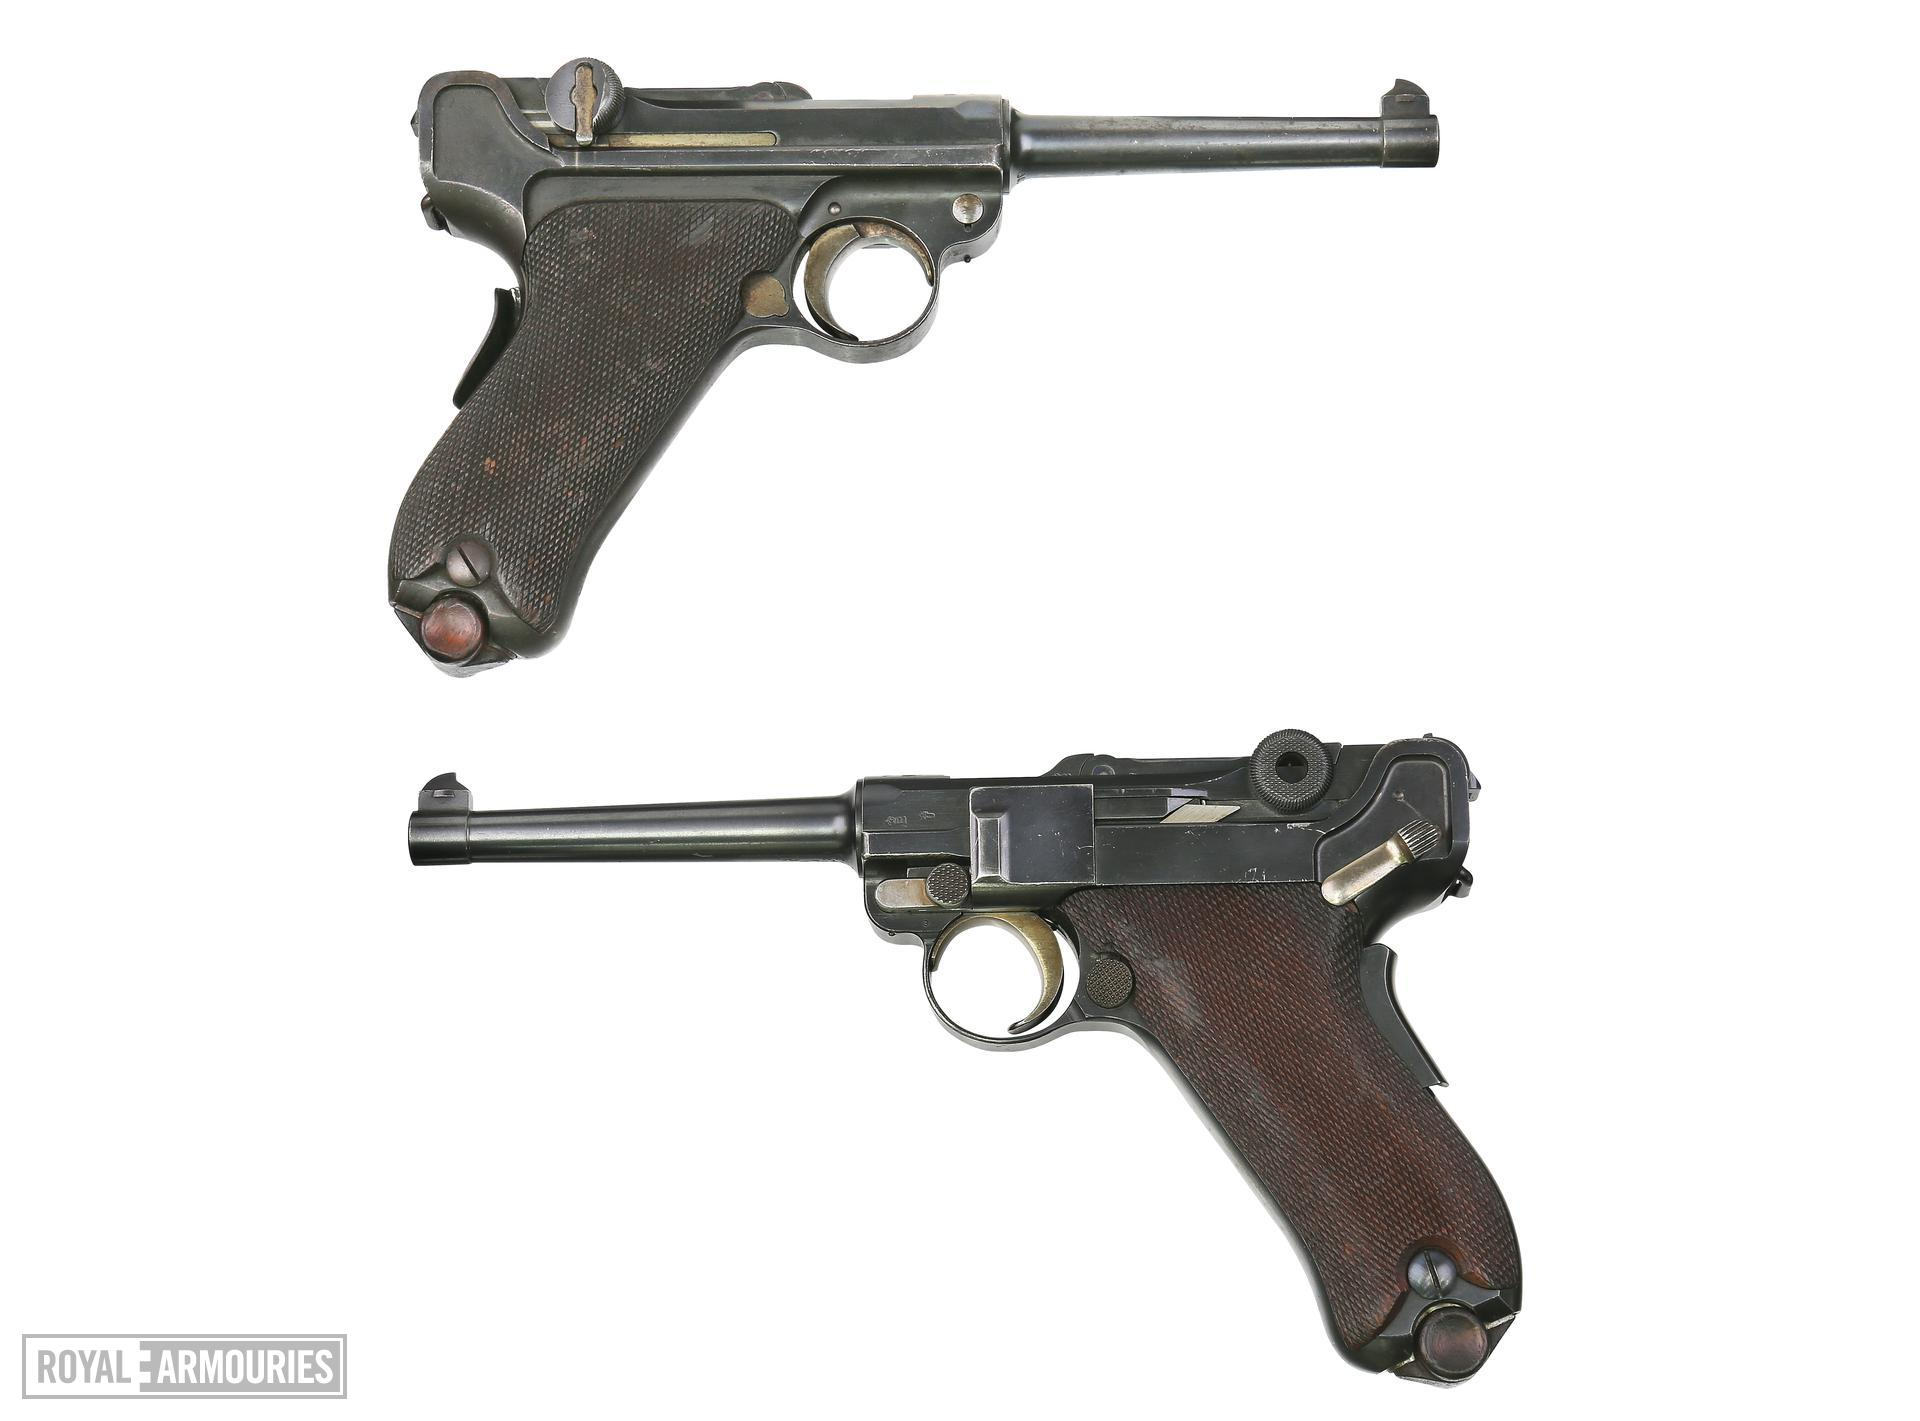 Centrefire self-loading pistol - Luger Model 1906, Commercial